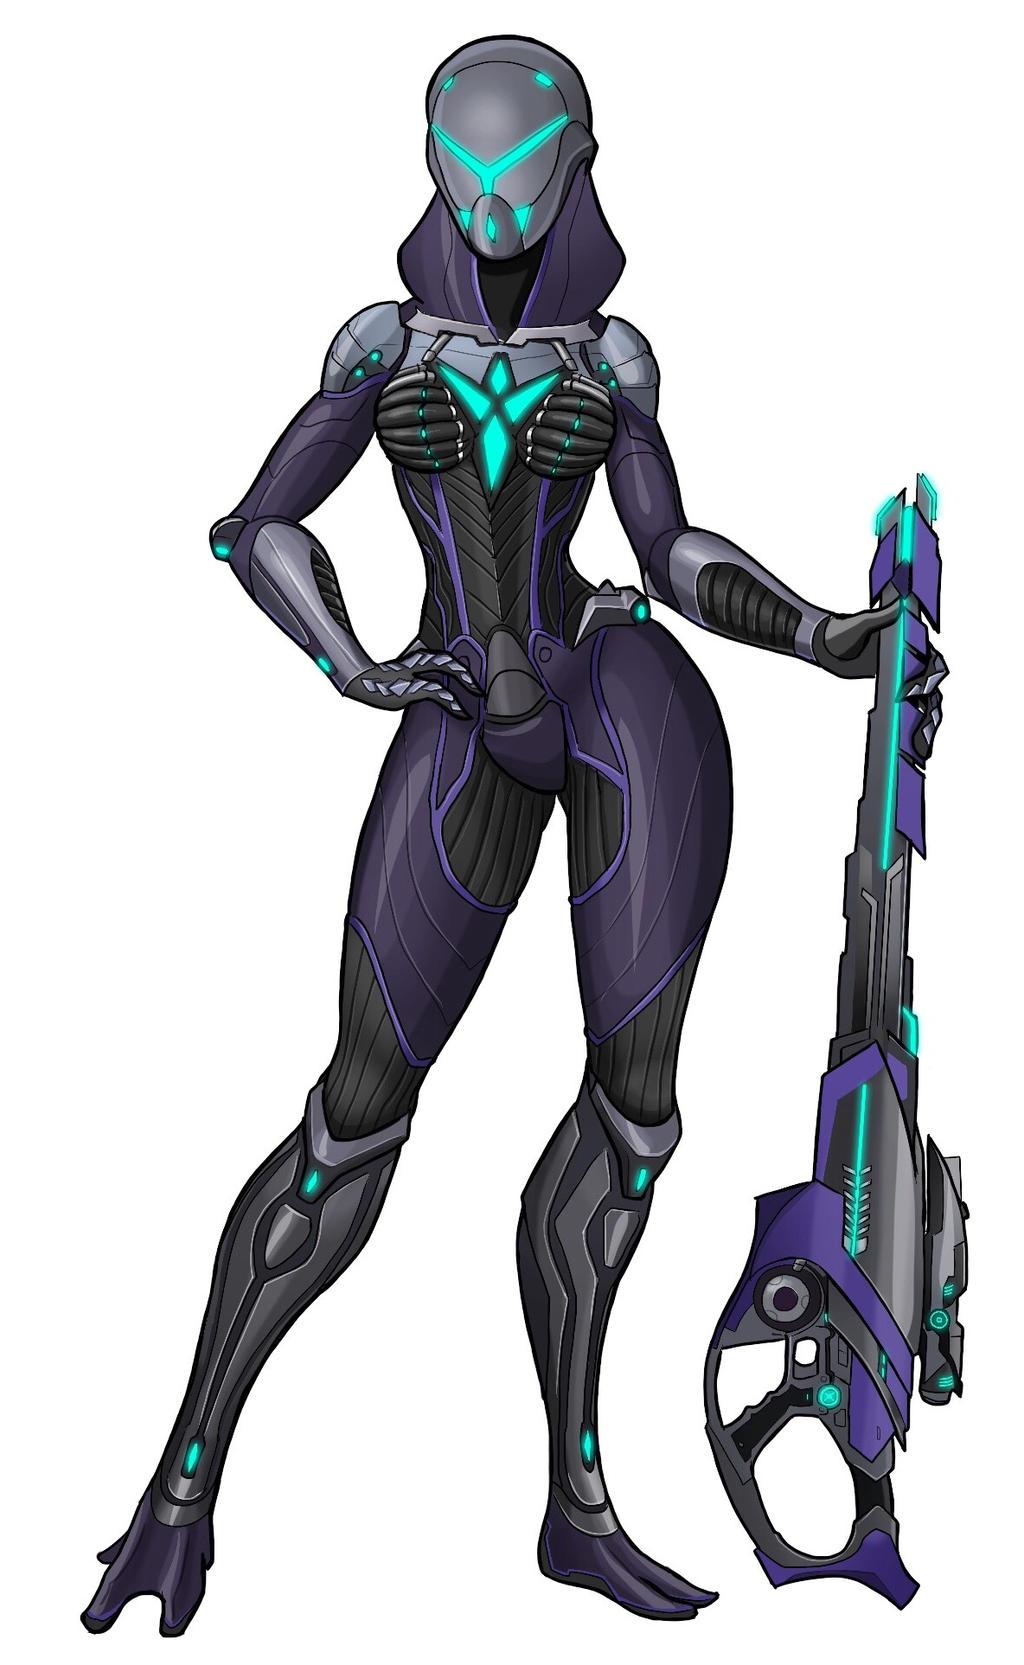 Tali - Vanu infiltrator by spaceMAXmarine